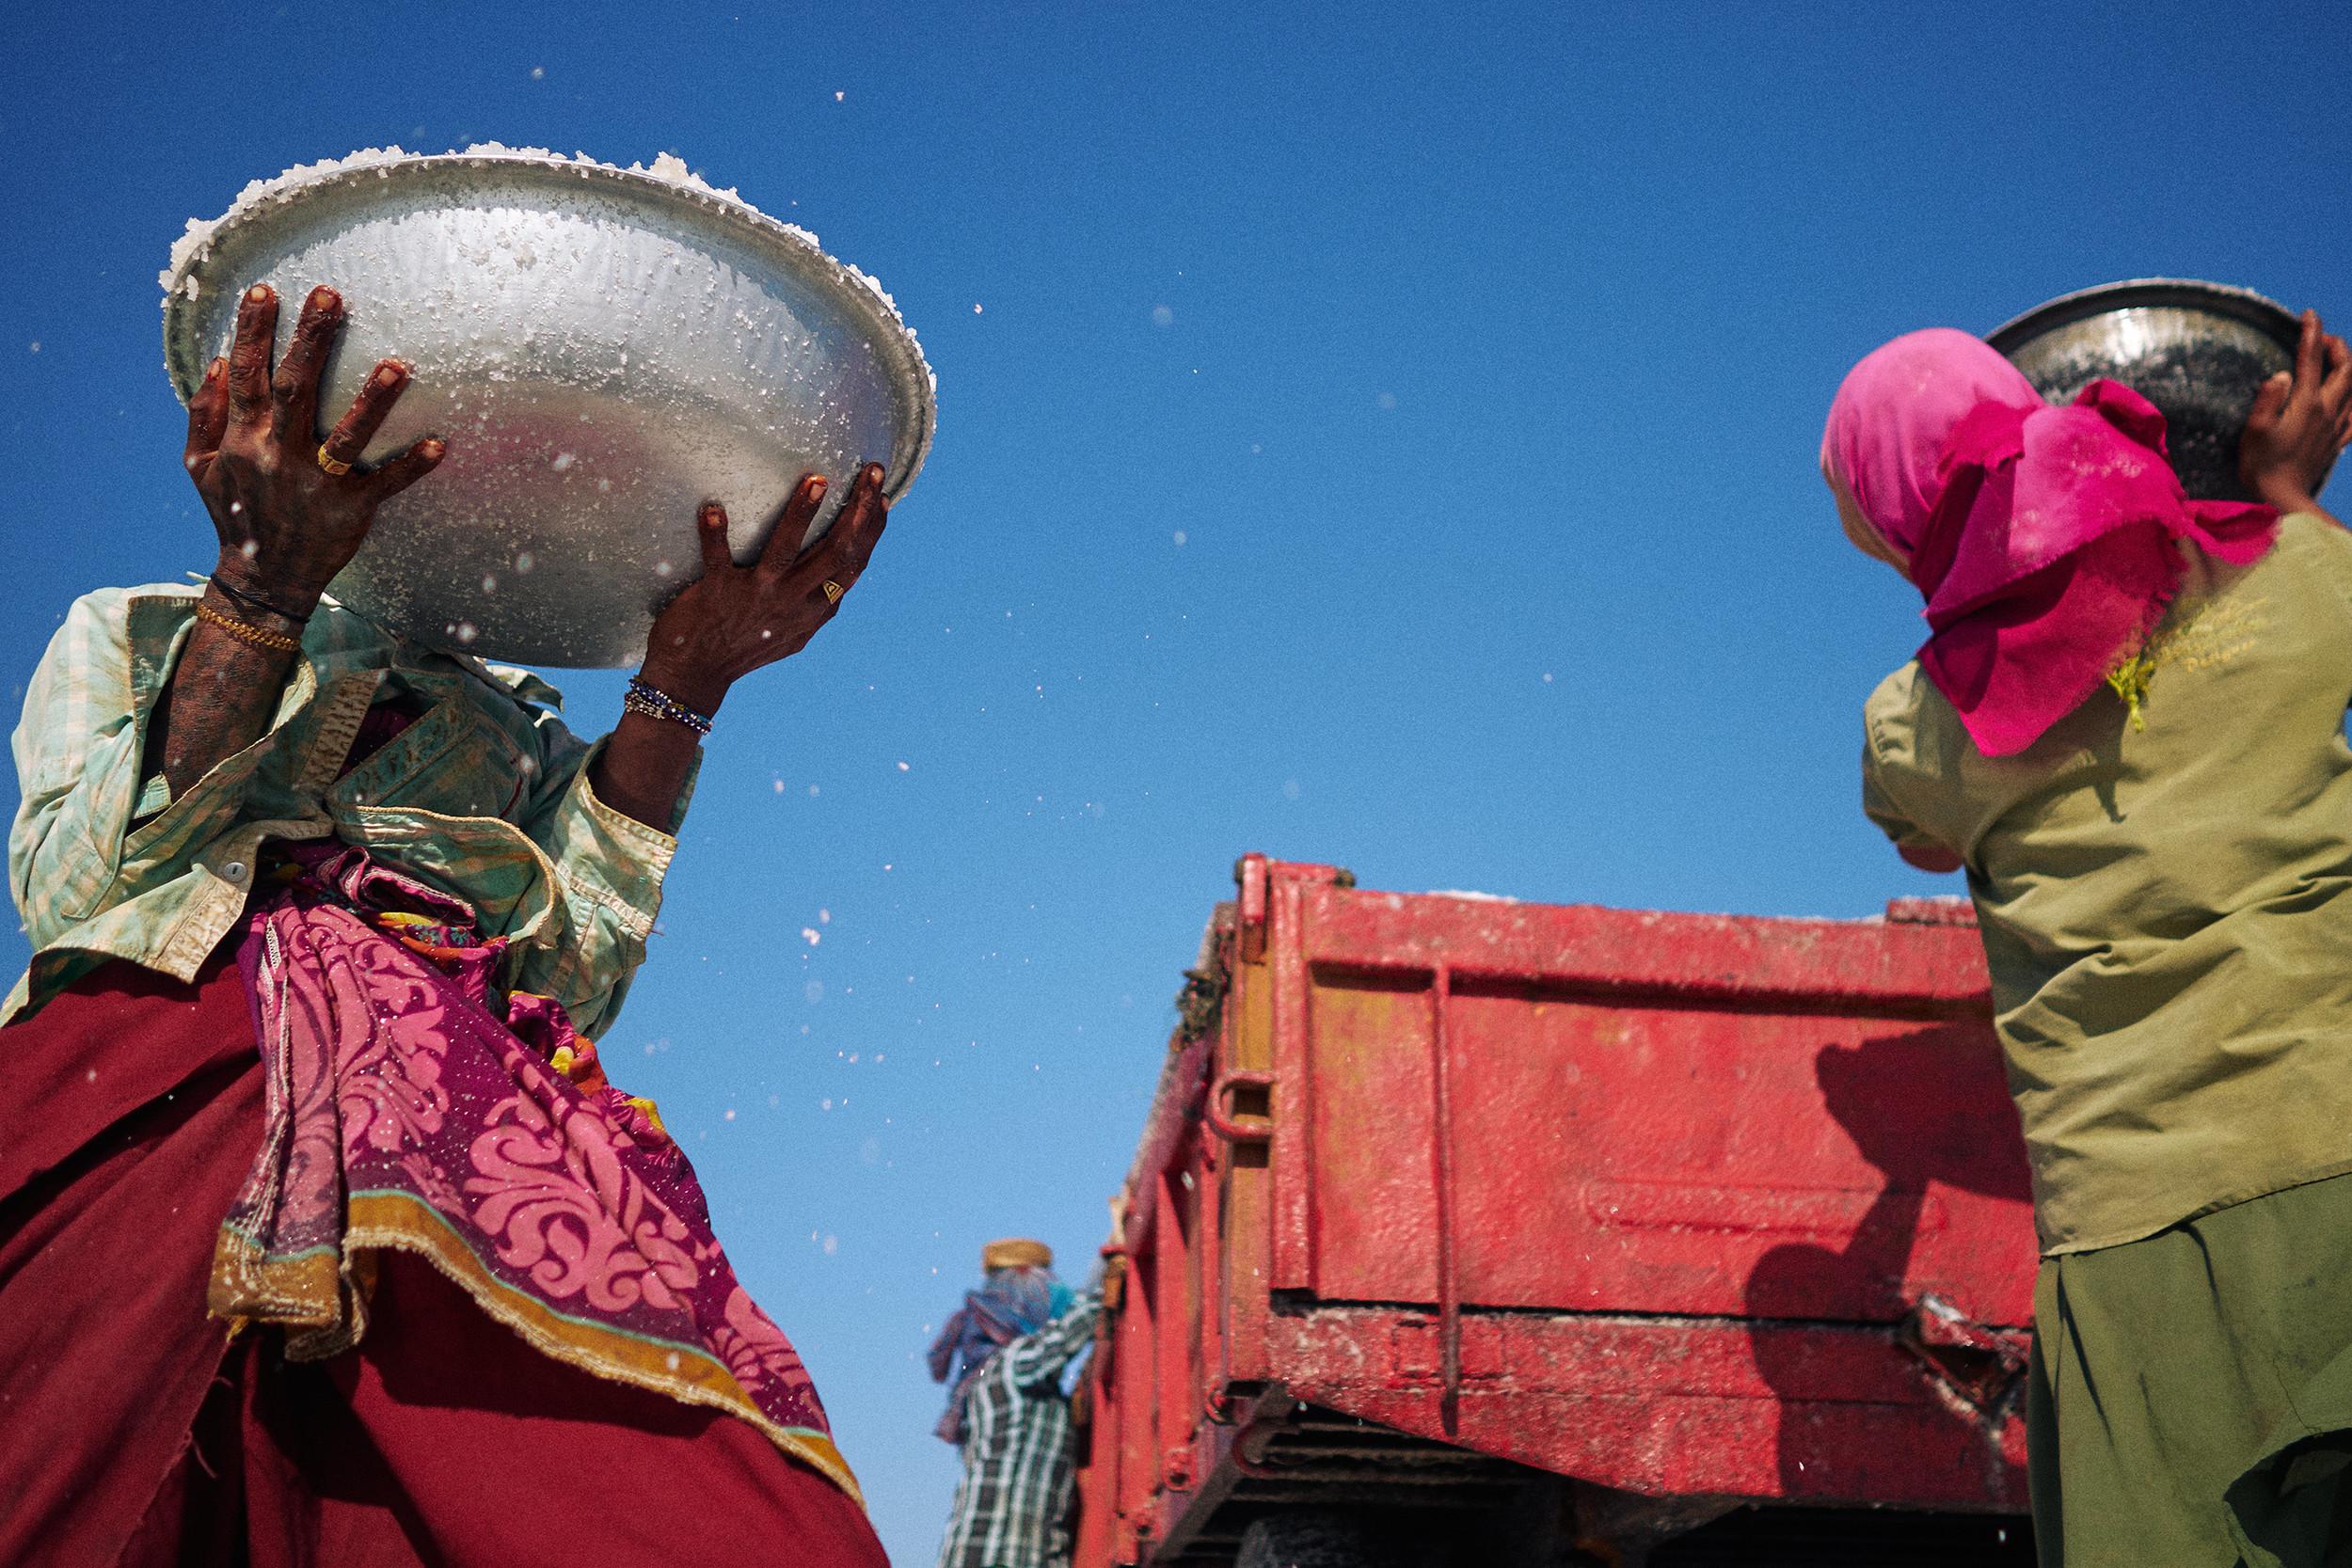 Woman salt worker lifting up a tub of salt